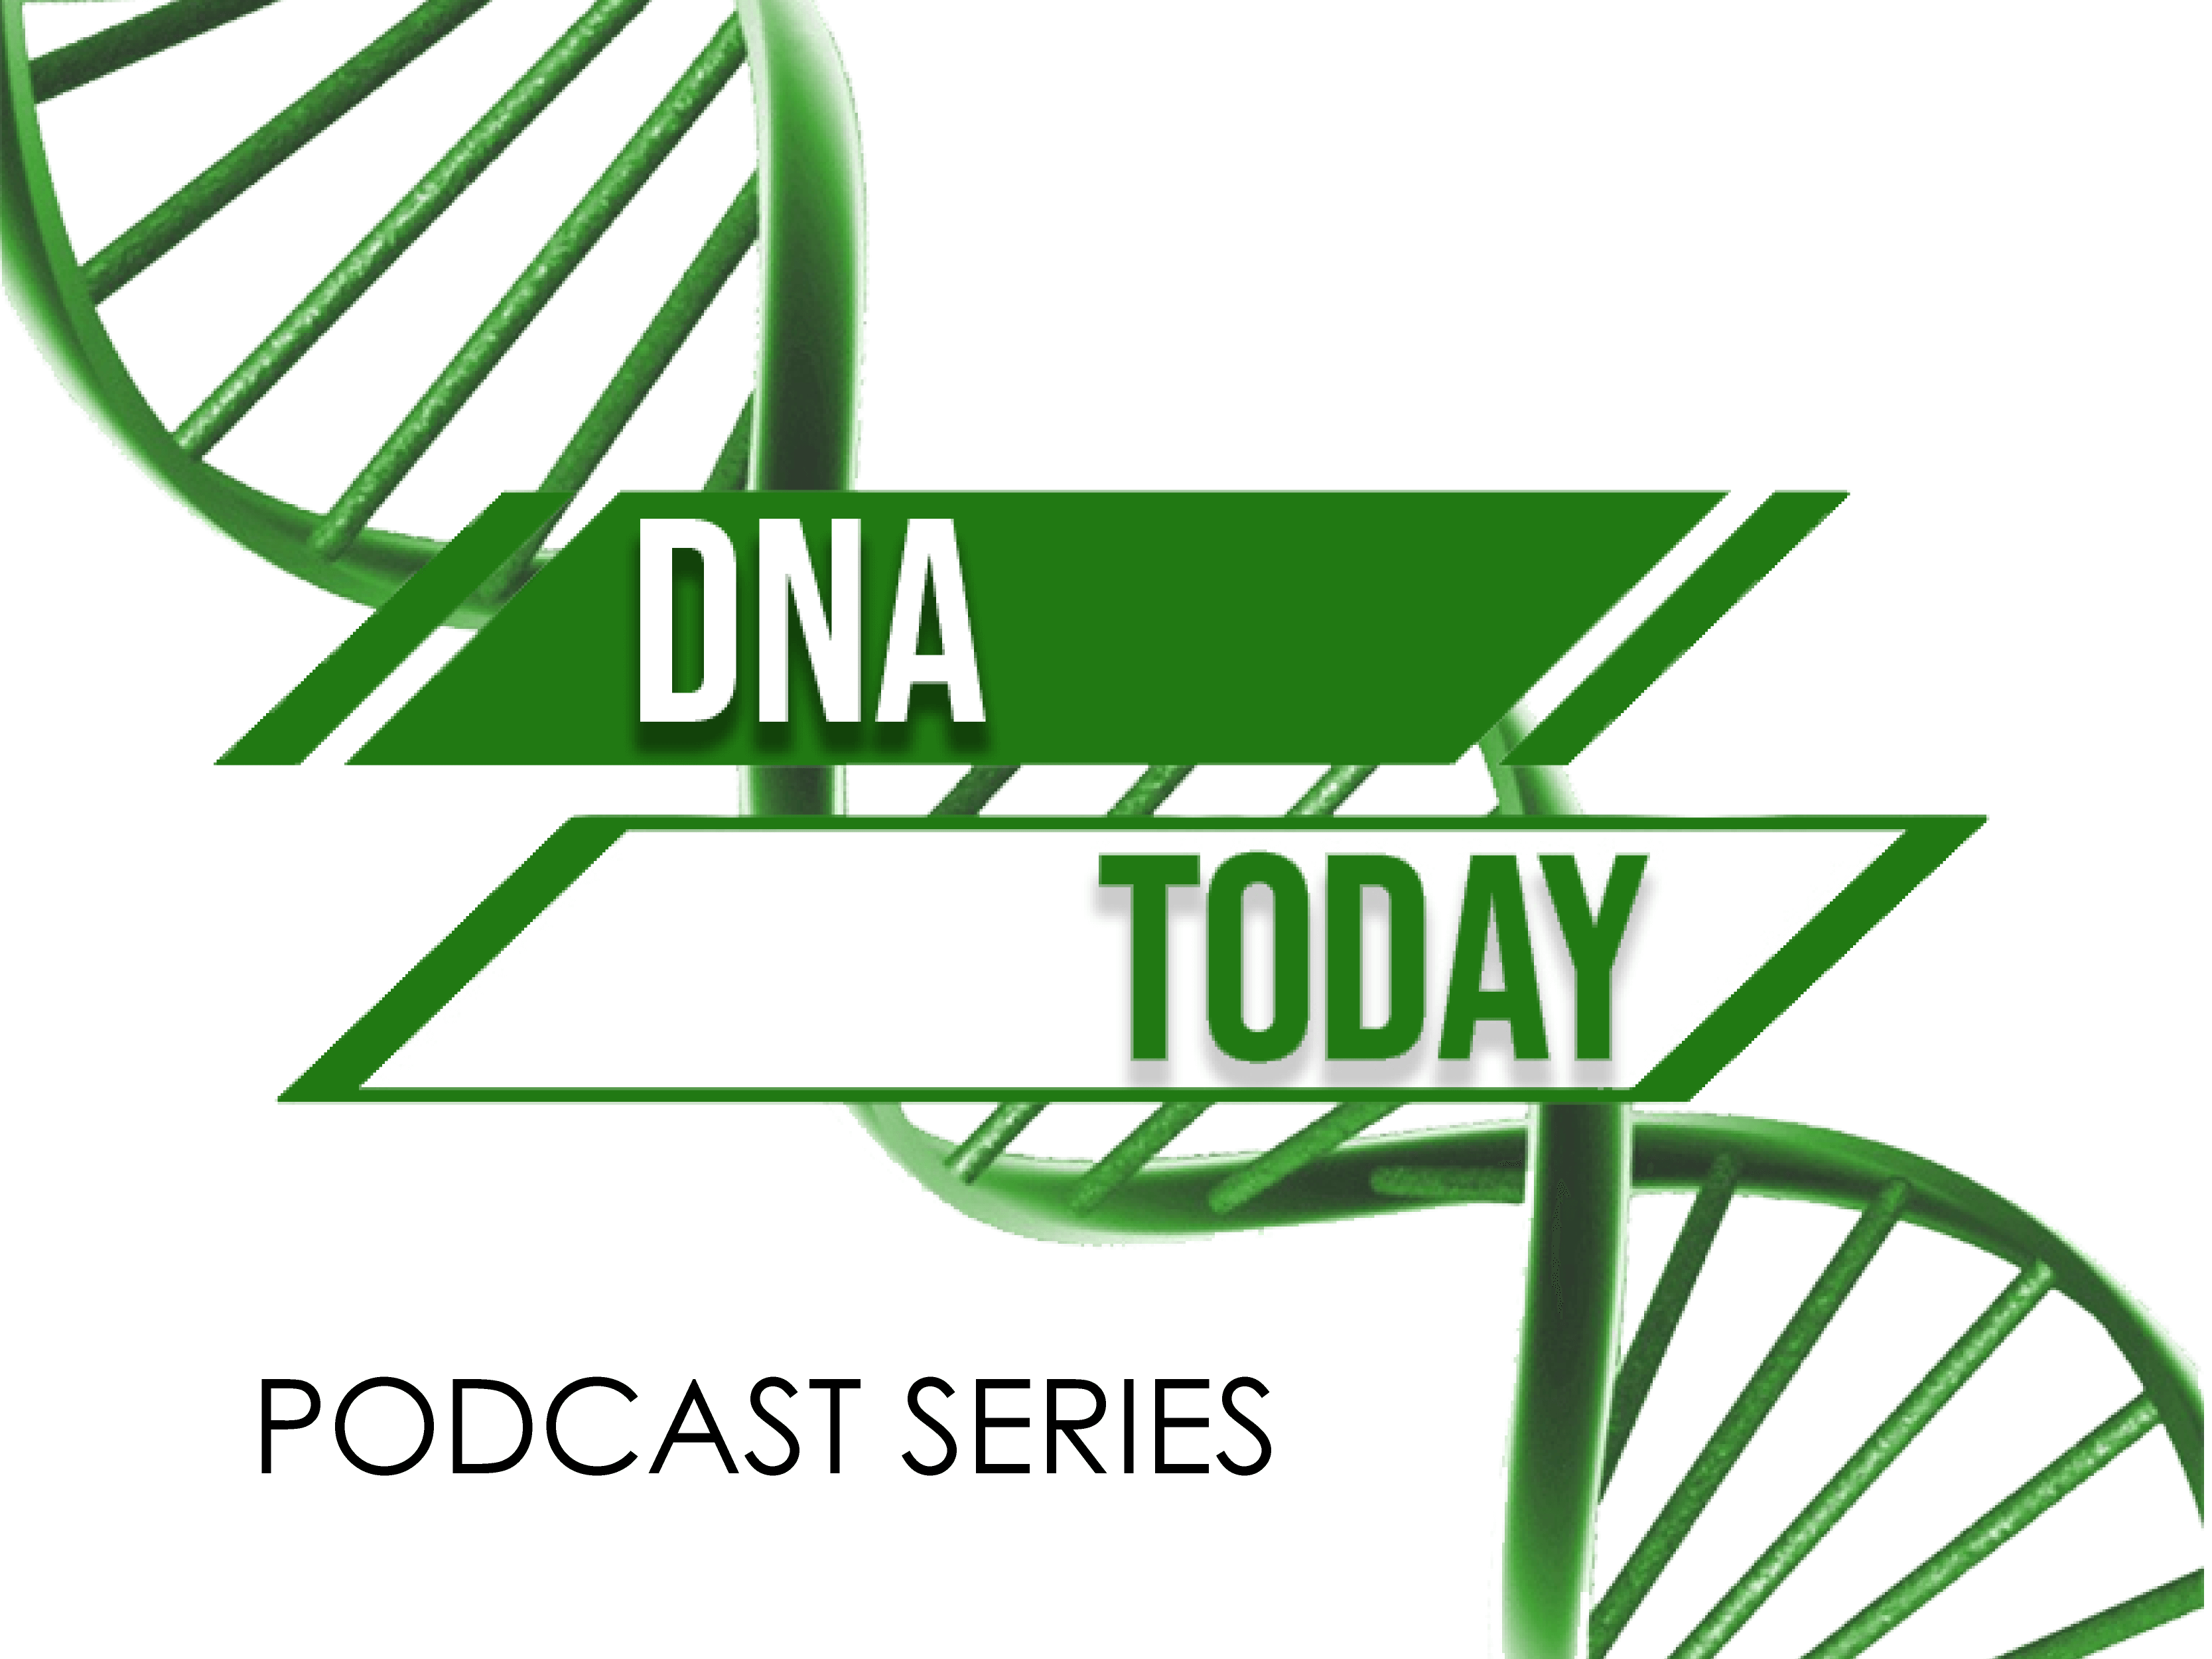 LATEST PODCAST<h5>Mark Kiel on ALS Genetics</b><br><h6><b>Friday, October 1, 2021 </h6></b>